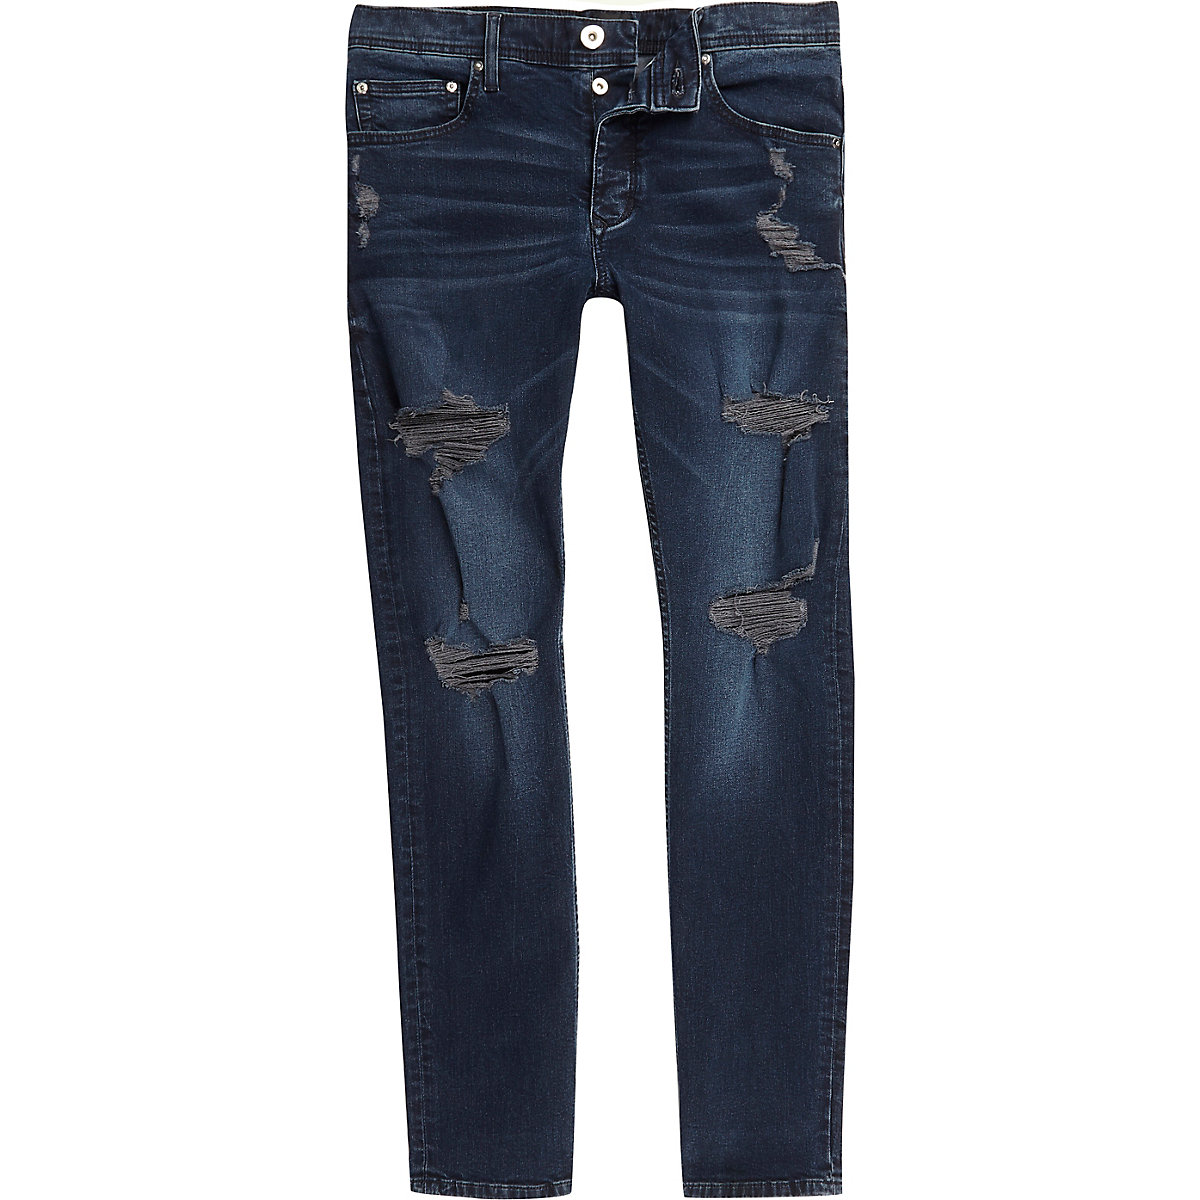 Sid – Jean skinny bleu foncé usé